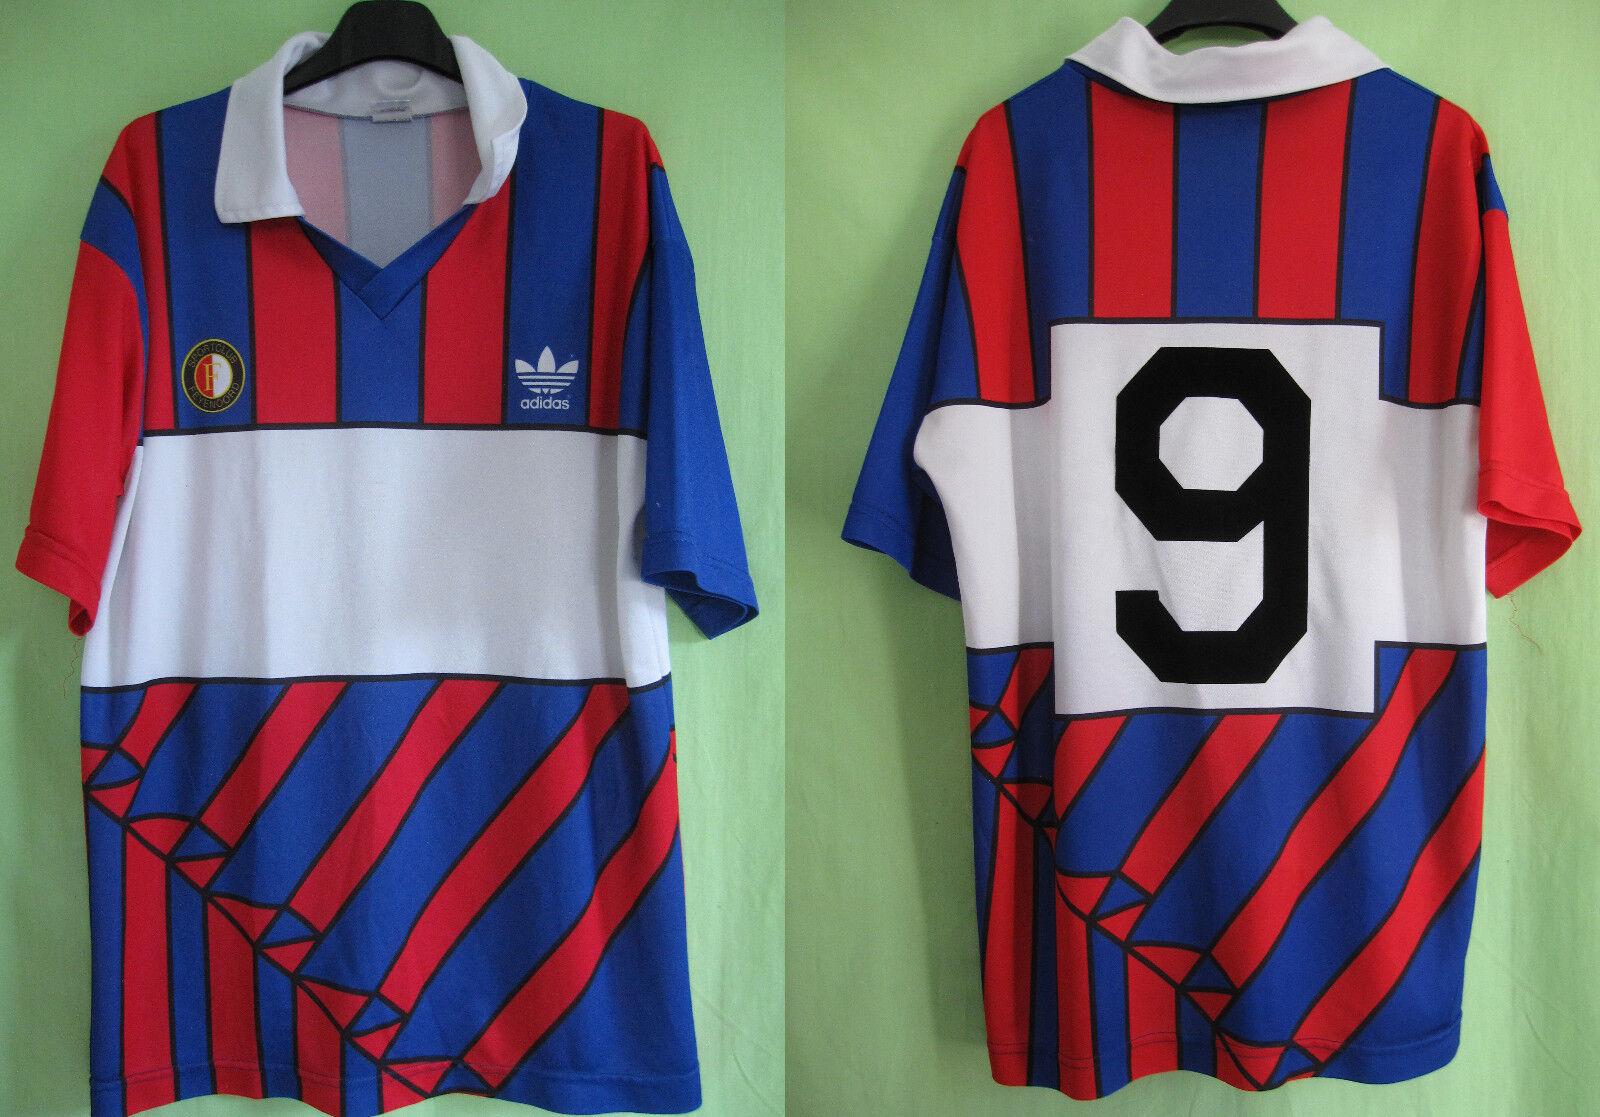 Maillot Adidas Feyenoord 1990 rossoterdam  9 Vintage Football Jersey  L